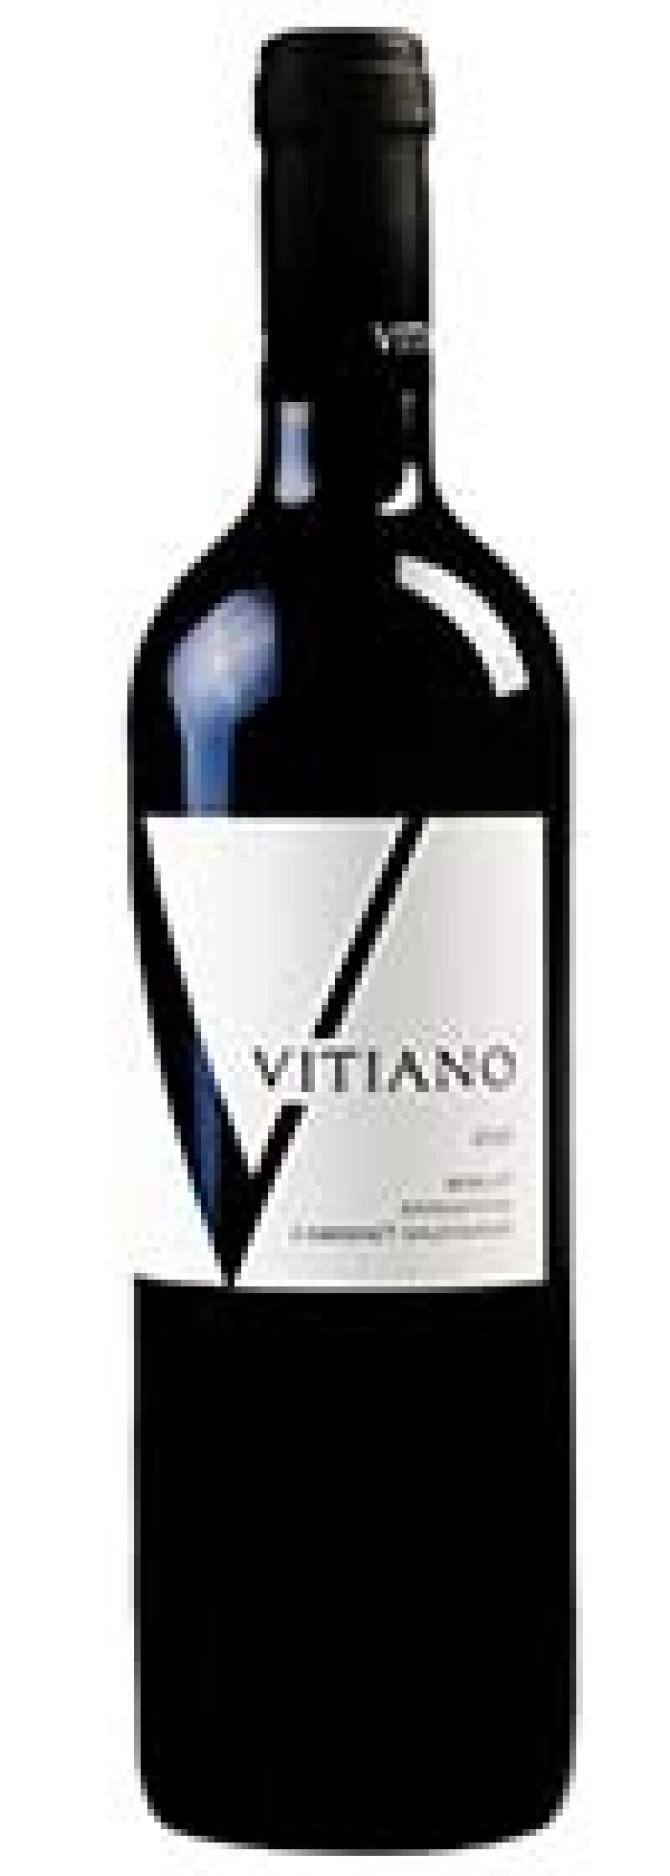 Falesco Vitiano Rosso Umbria 2010